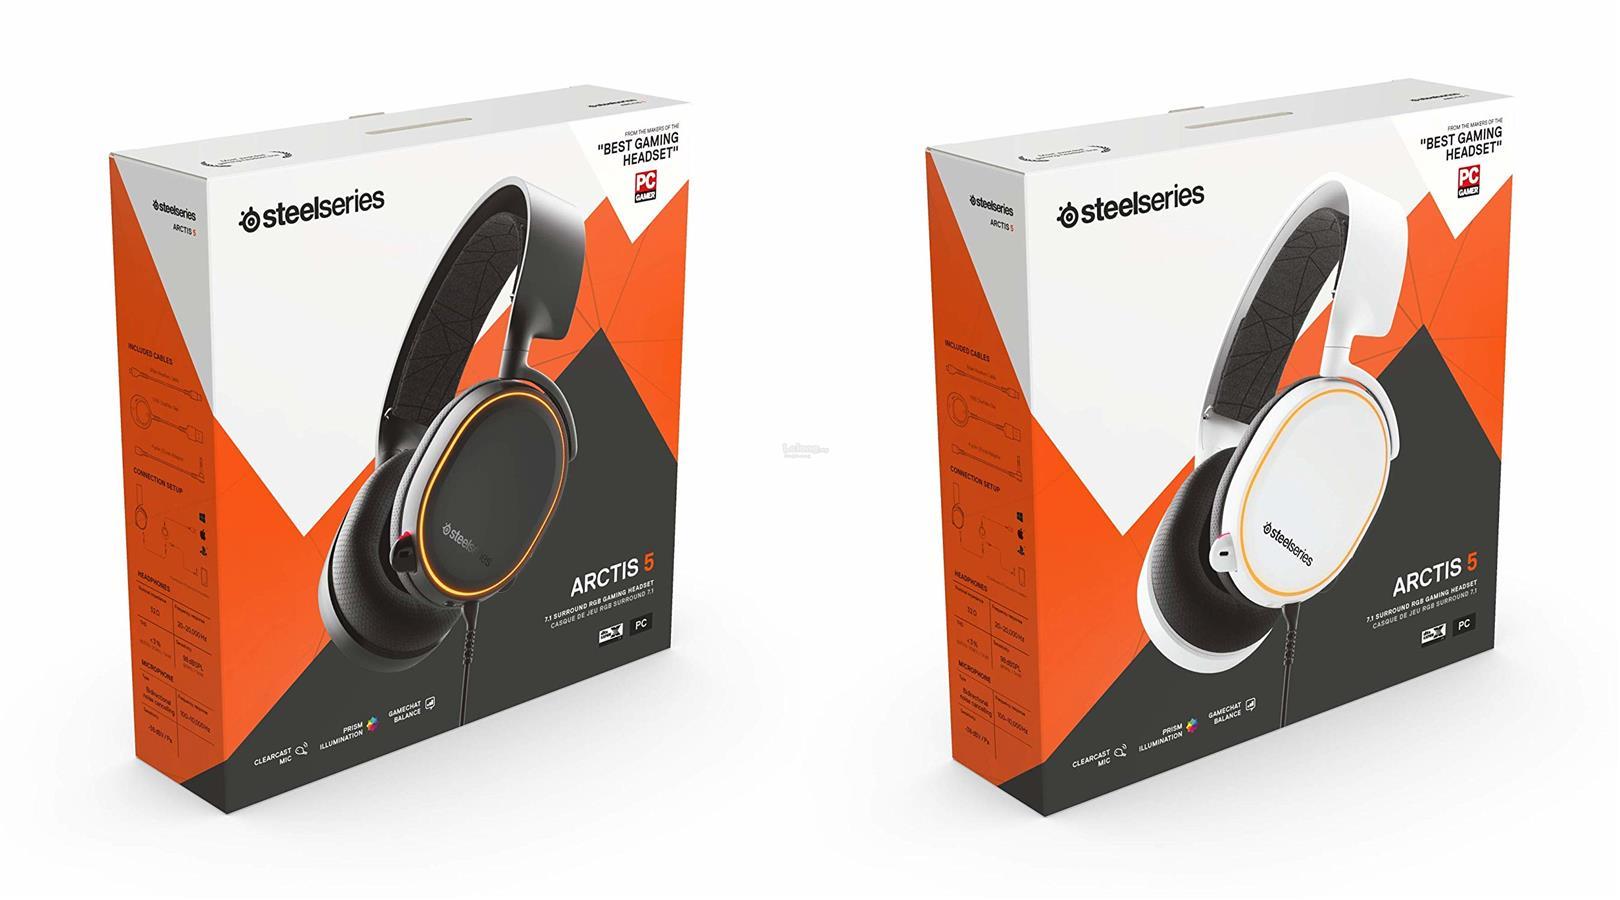 # STEELSERIES Arctis 5 RGB Illuminated Gaming Headset # 2019 Edition